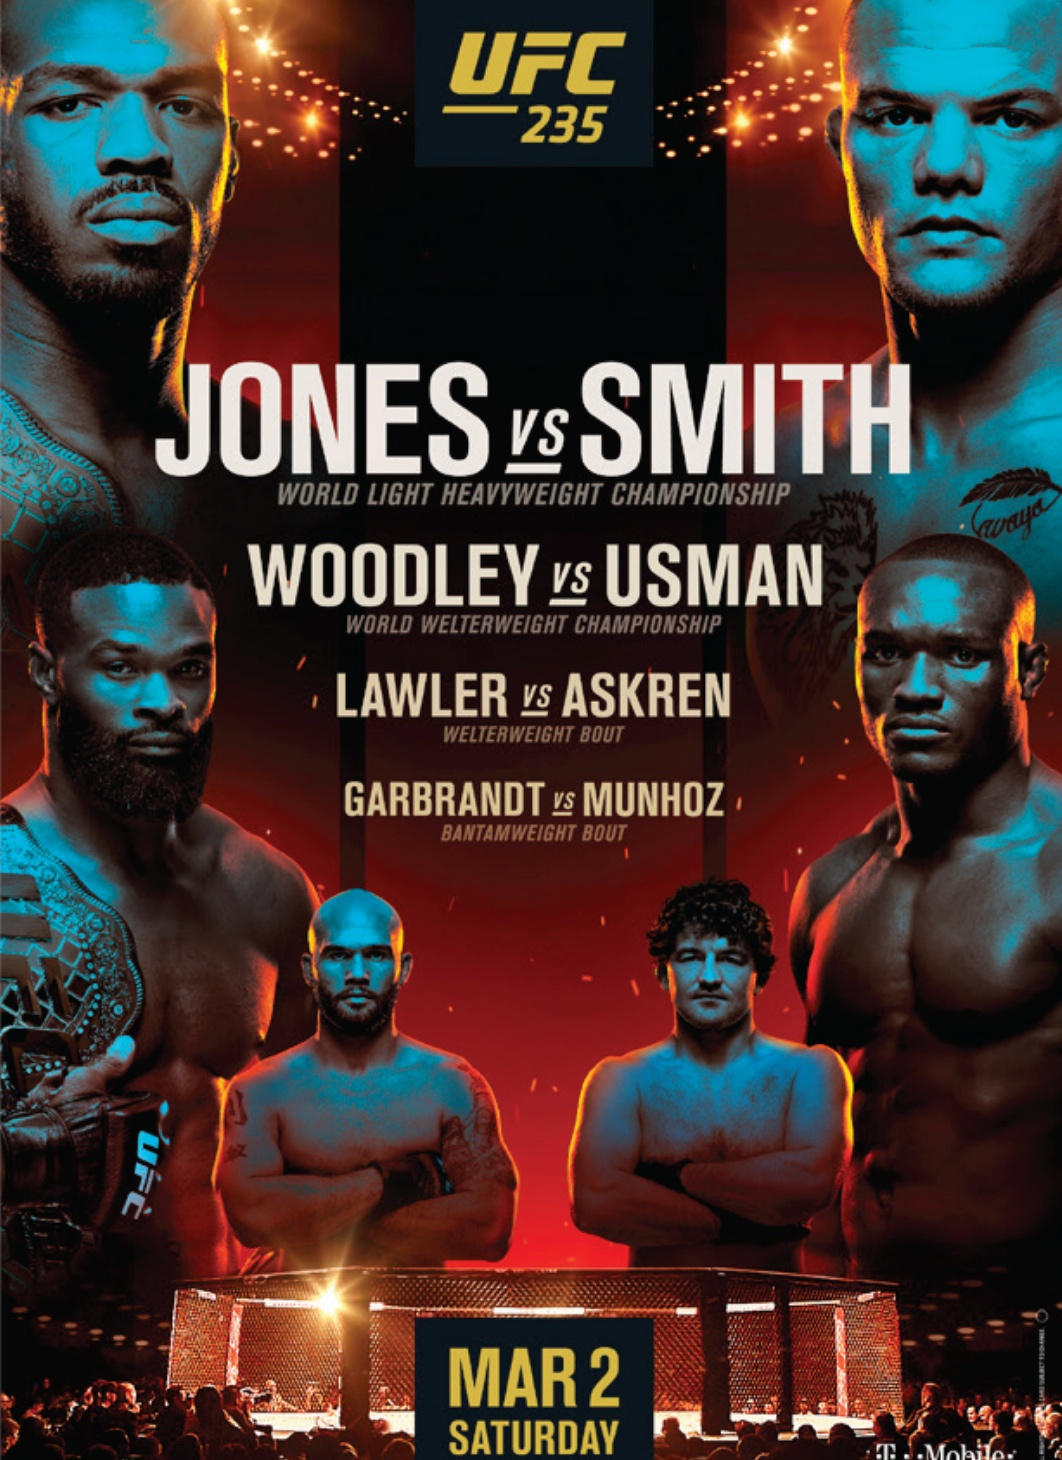 MMA Fight Opinion: UFC 235 Jones vs Smith: Fight Card, Half